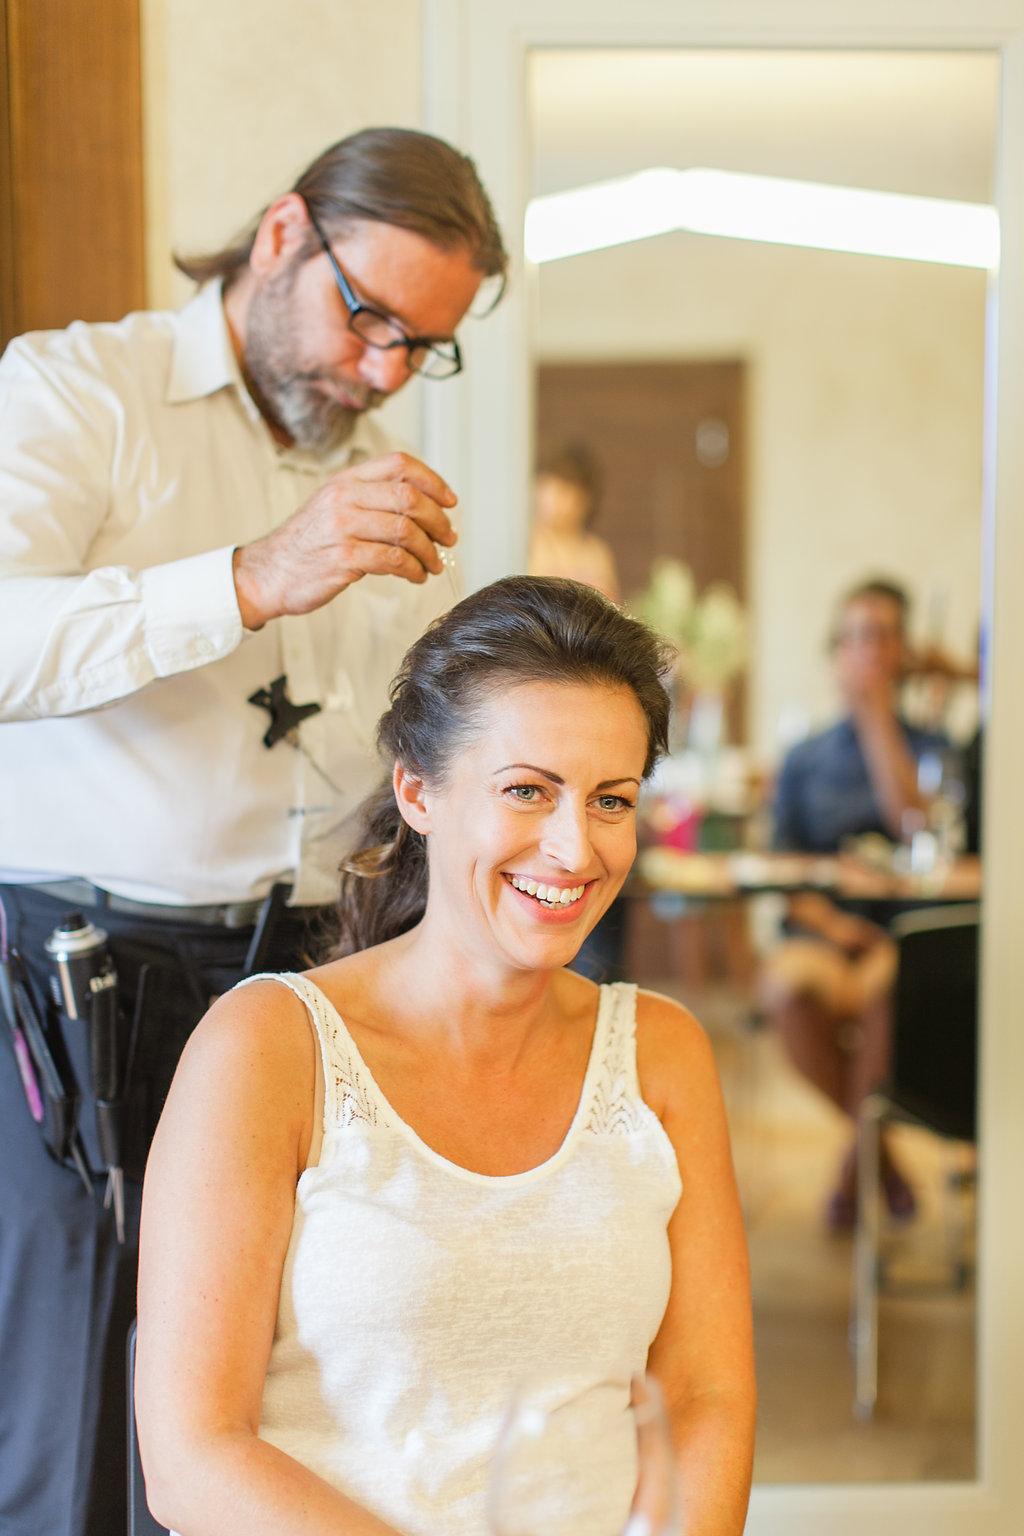 castelfalfi-tuscany-wedding-photographer-roberta-facchini-65